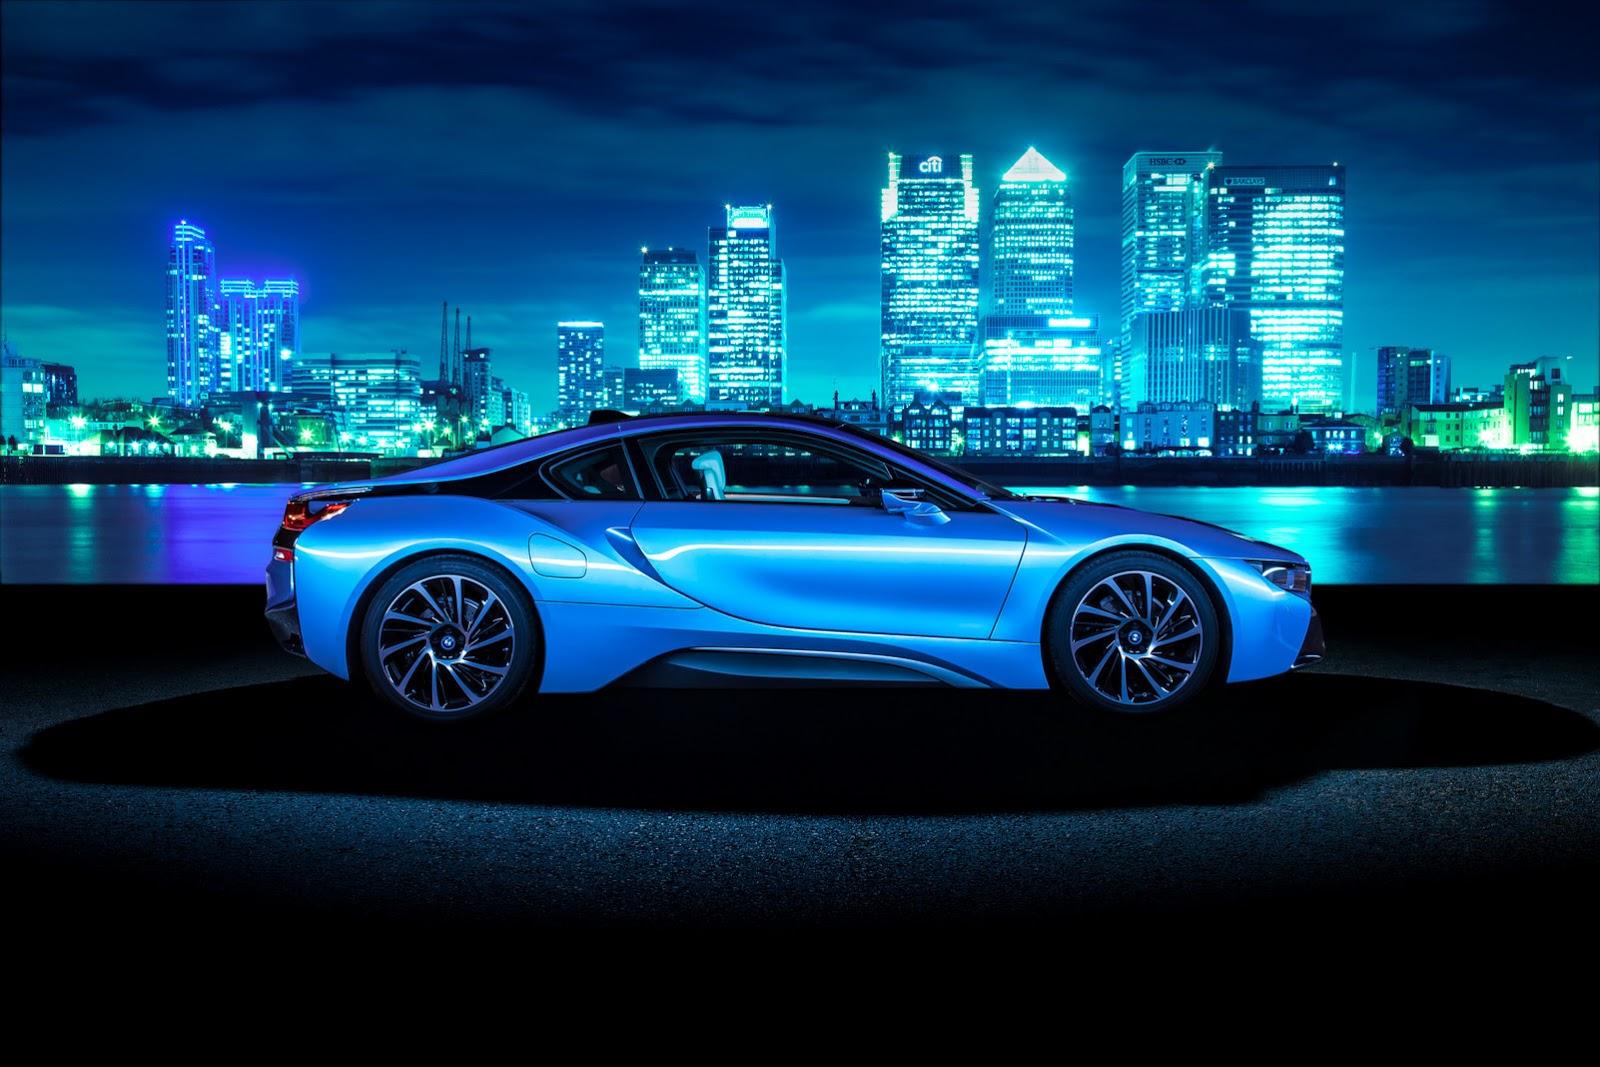 Photo Of The 2015 BMW i8 Tt Night